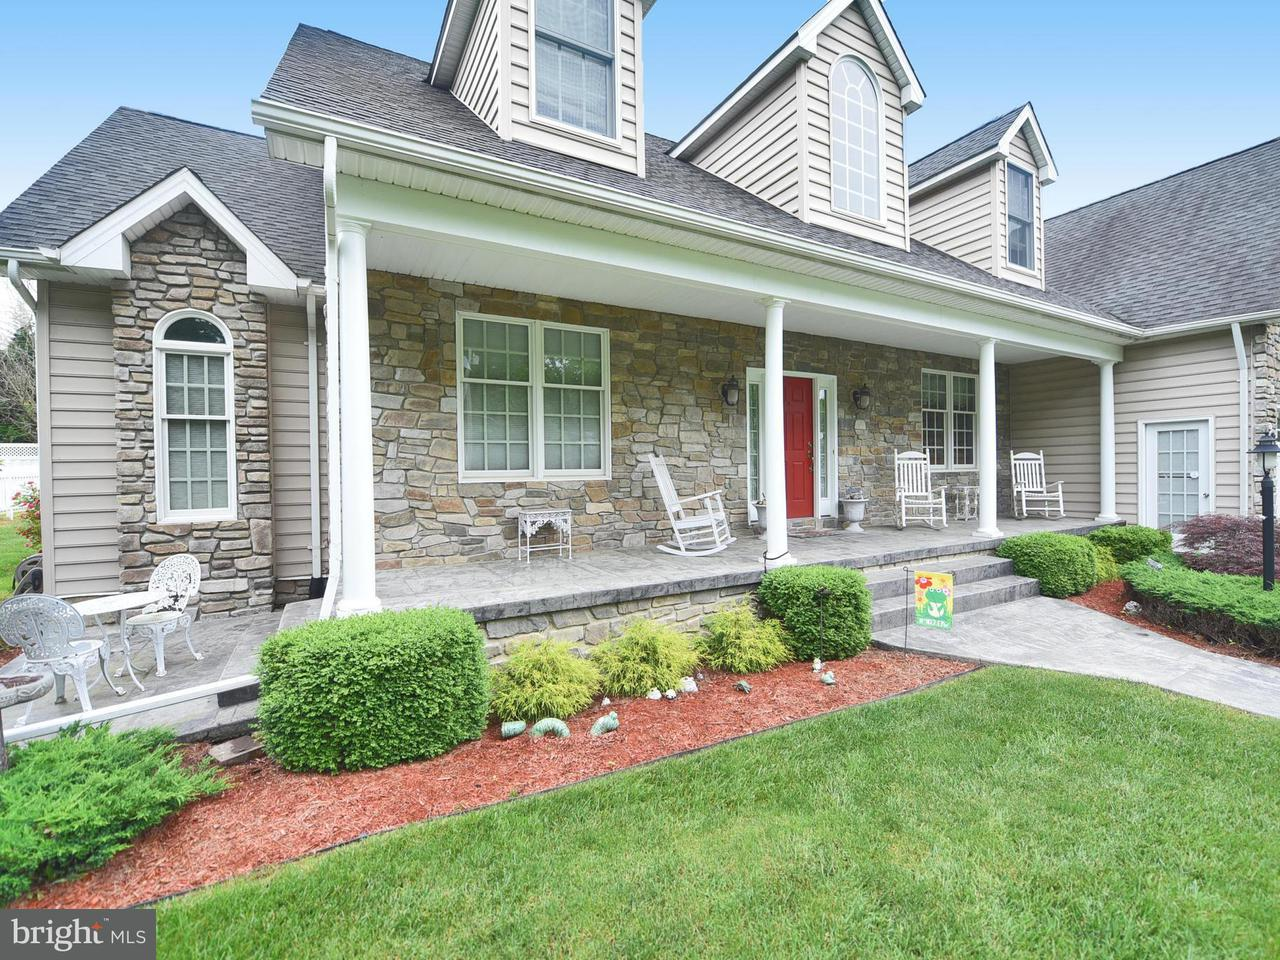 獨棟家庭住宅 為 出售 在 1307 OLD JOPPA Road 1307 OLD JOPPA Road Joppa, 馬里蘭州 21085 美國